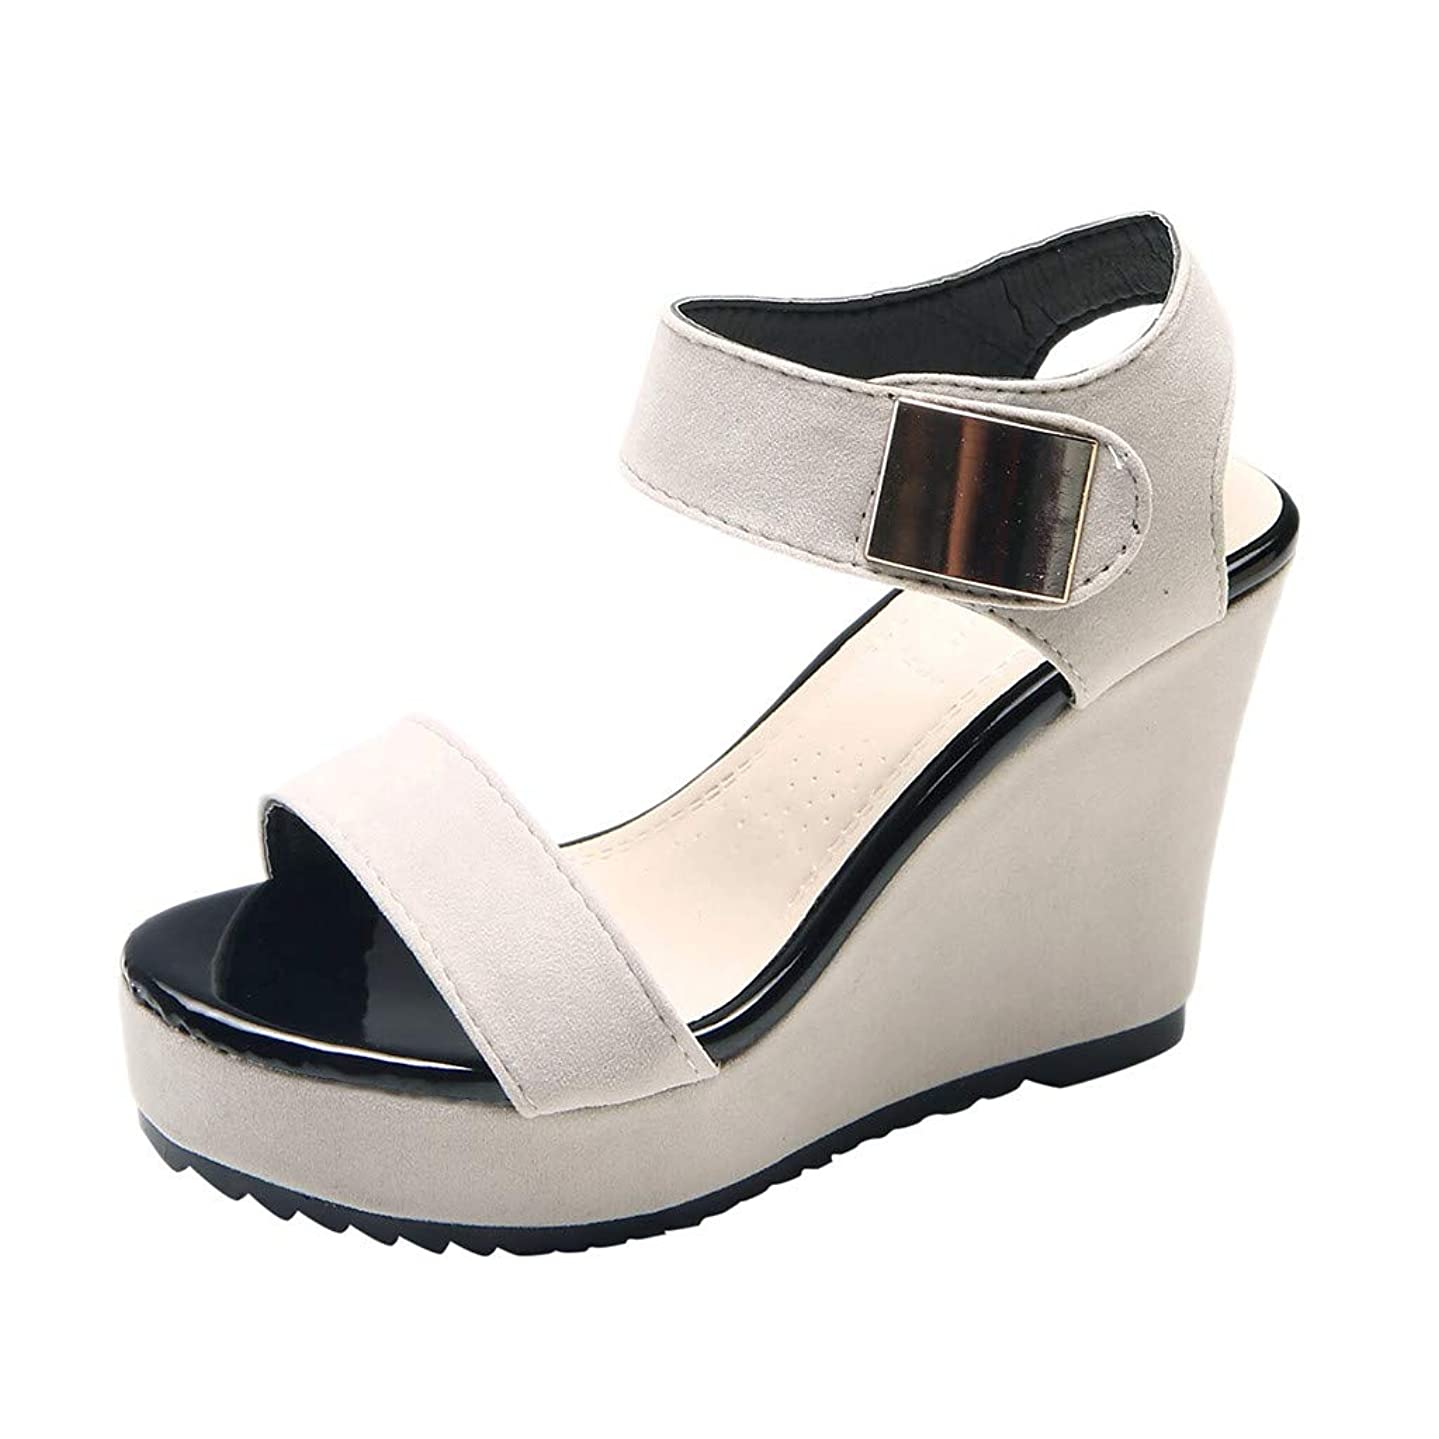 LUCA Women's Wedges Sandals Summer High Platform Elastic Band Open Toe Slingback Ankle Strap Shoes